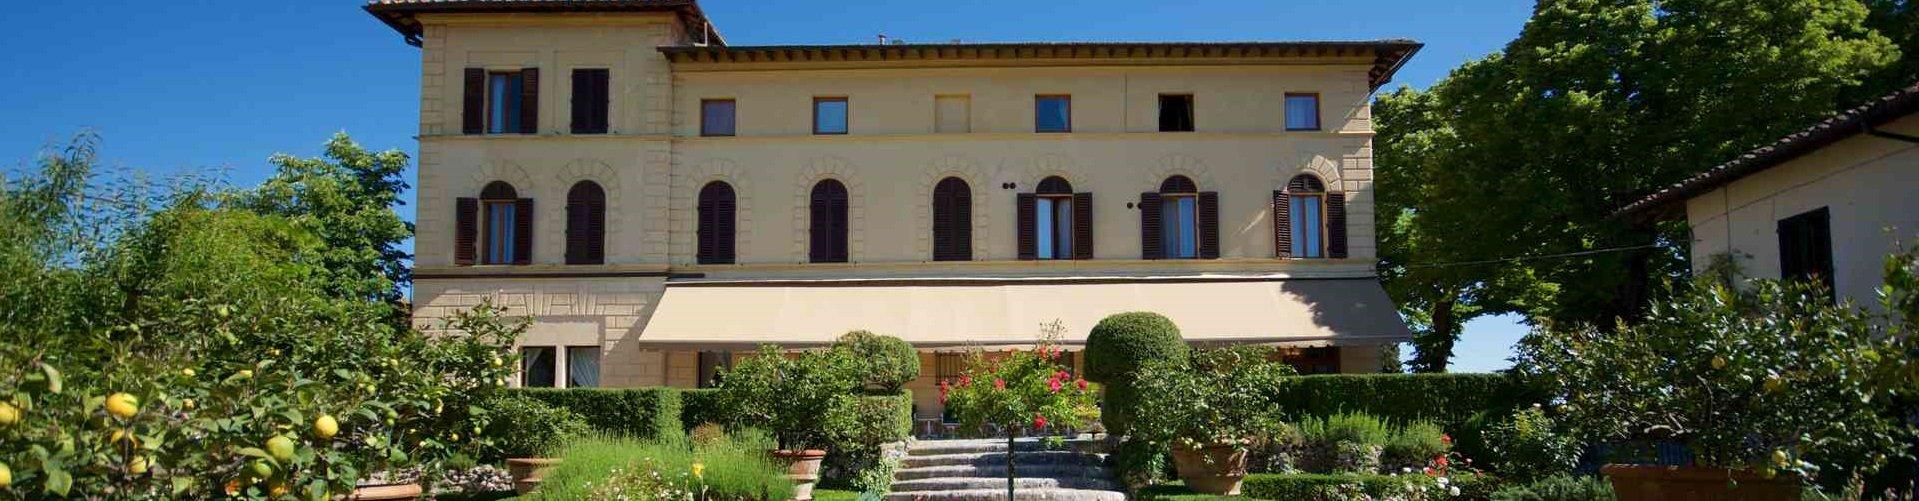 Villa Scacciapensieri banner foto